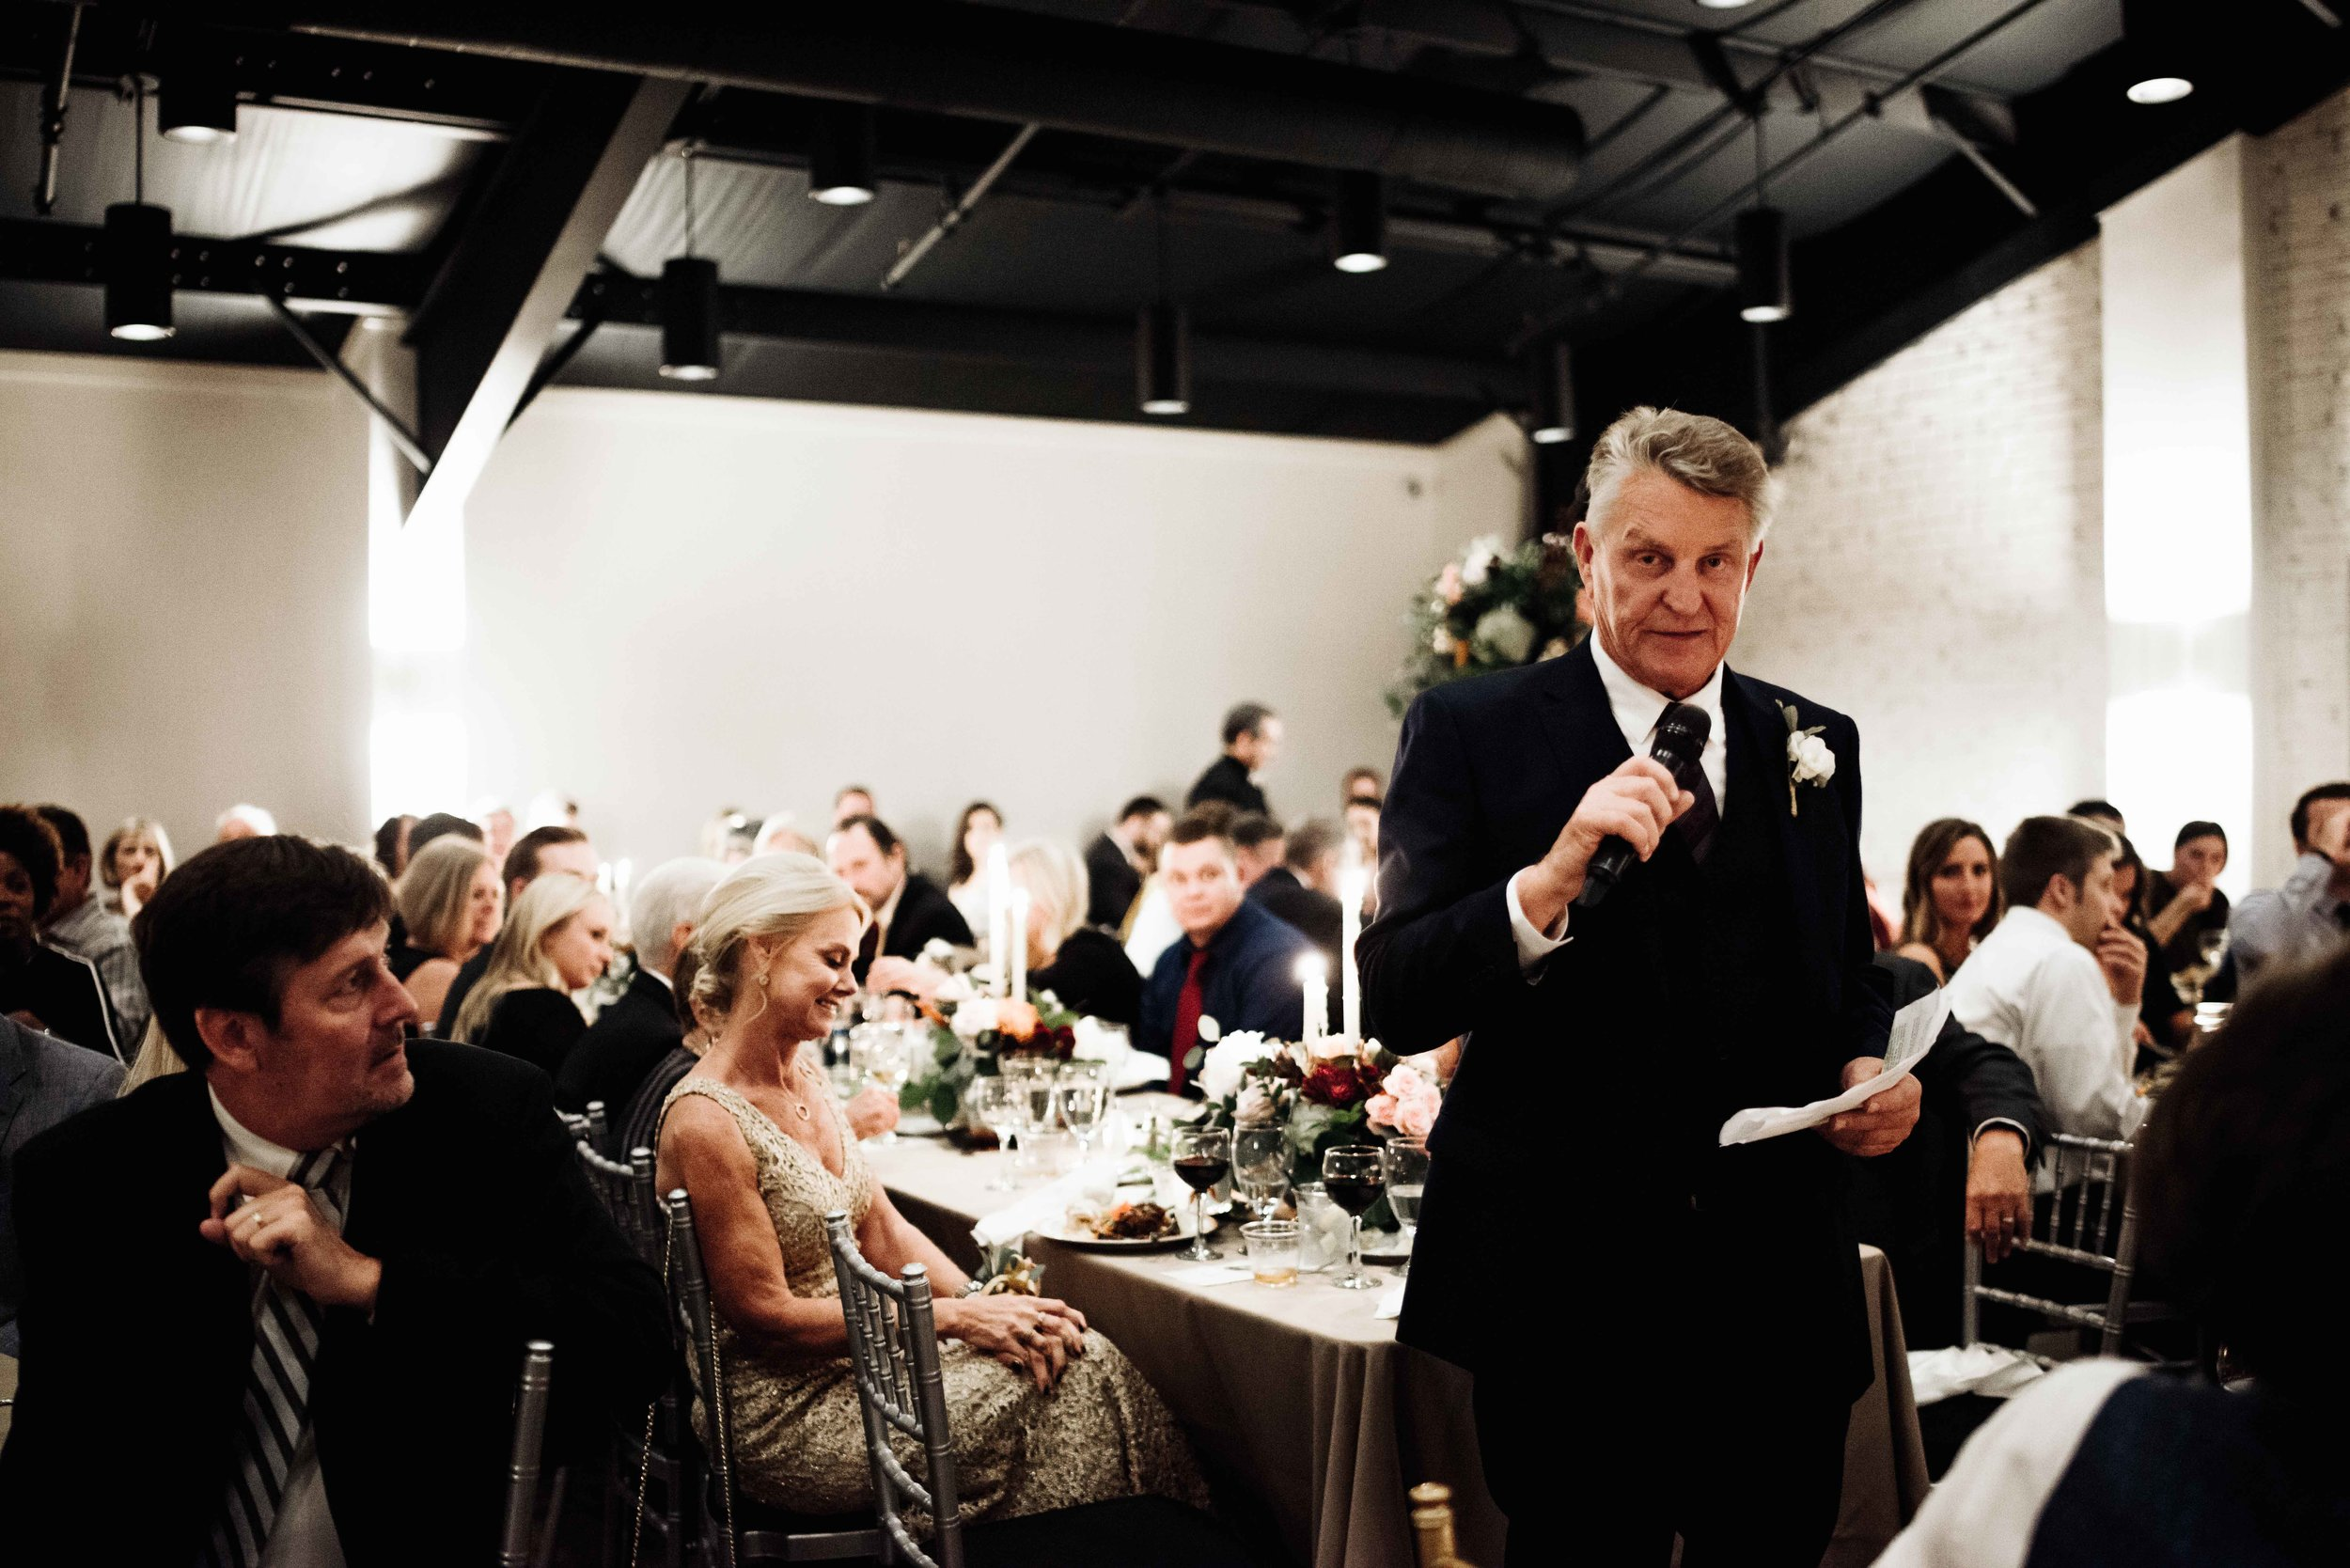 Carlee-Bob-Indianapolis-Wedding-Blog-98.jpg